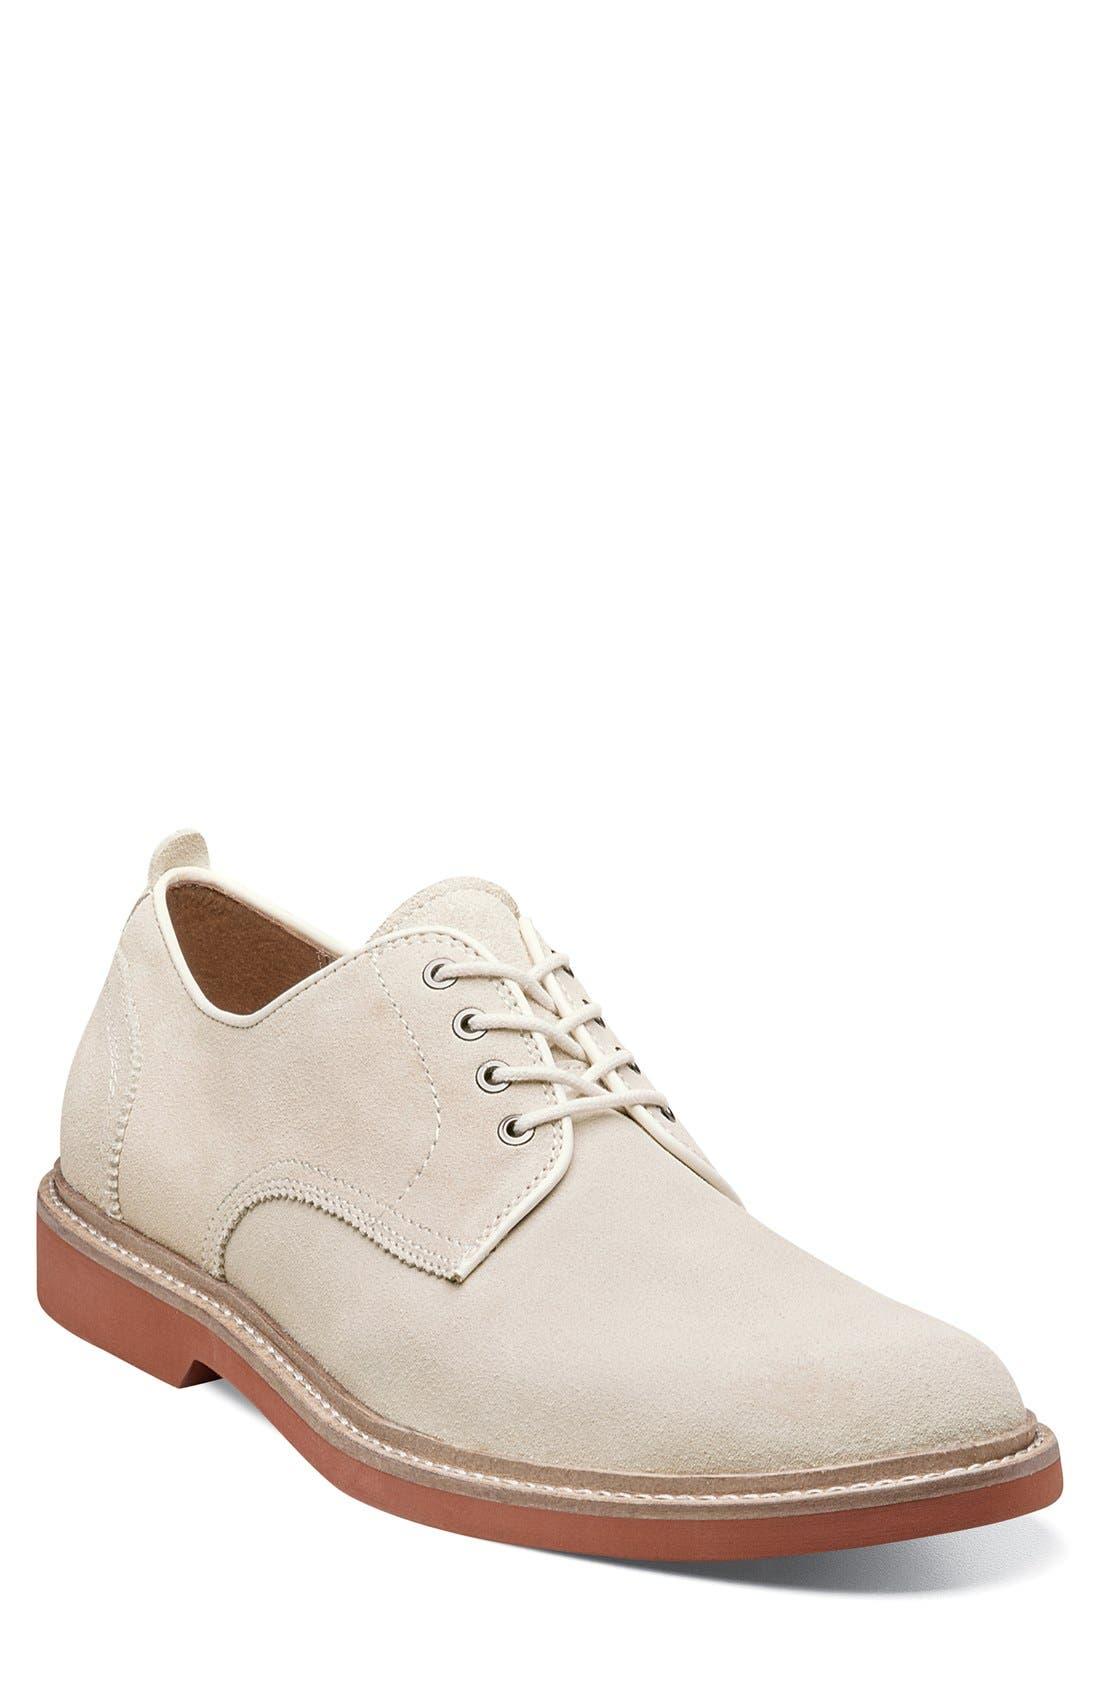 'Bucktown' Buck Shoe,                         Main,                         color, WHITE SUEDE